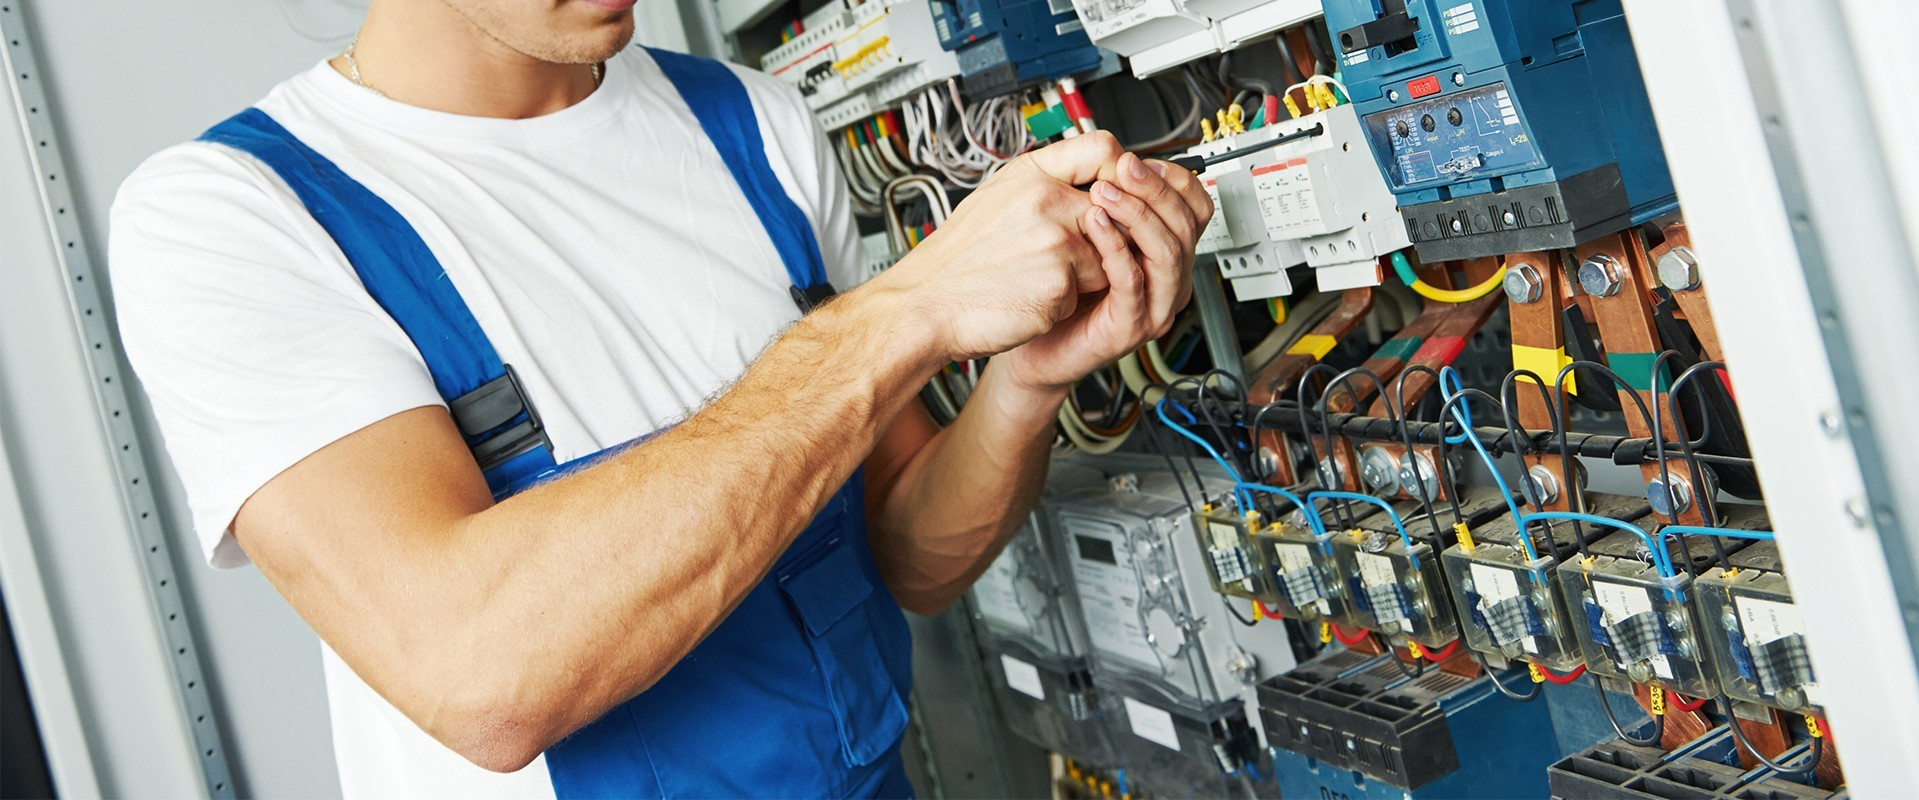 Как производится хороший электромонтаж?